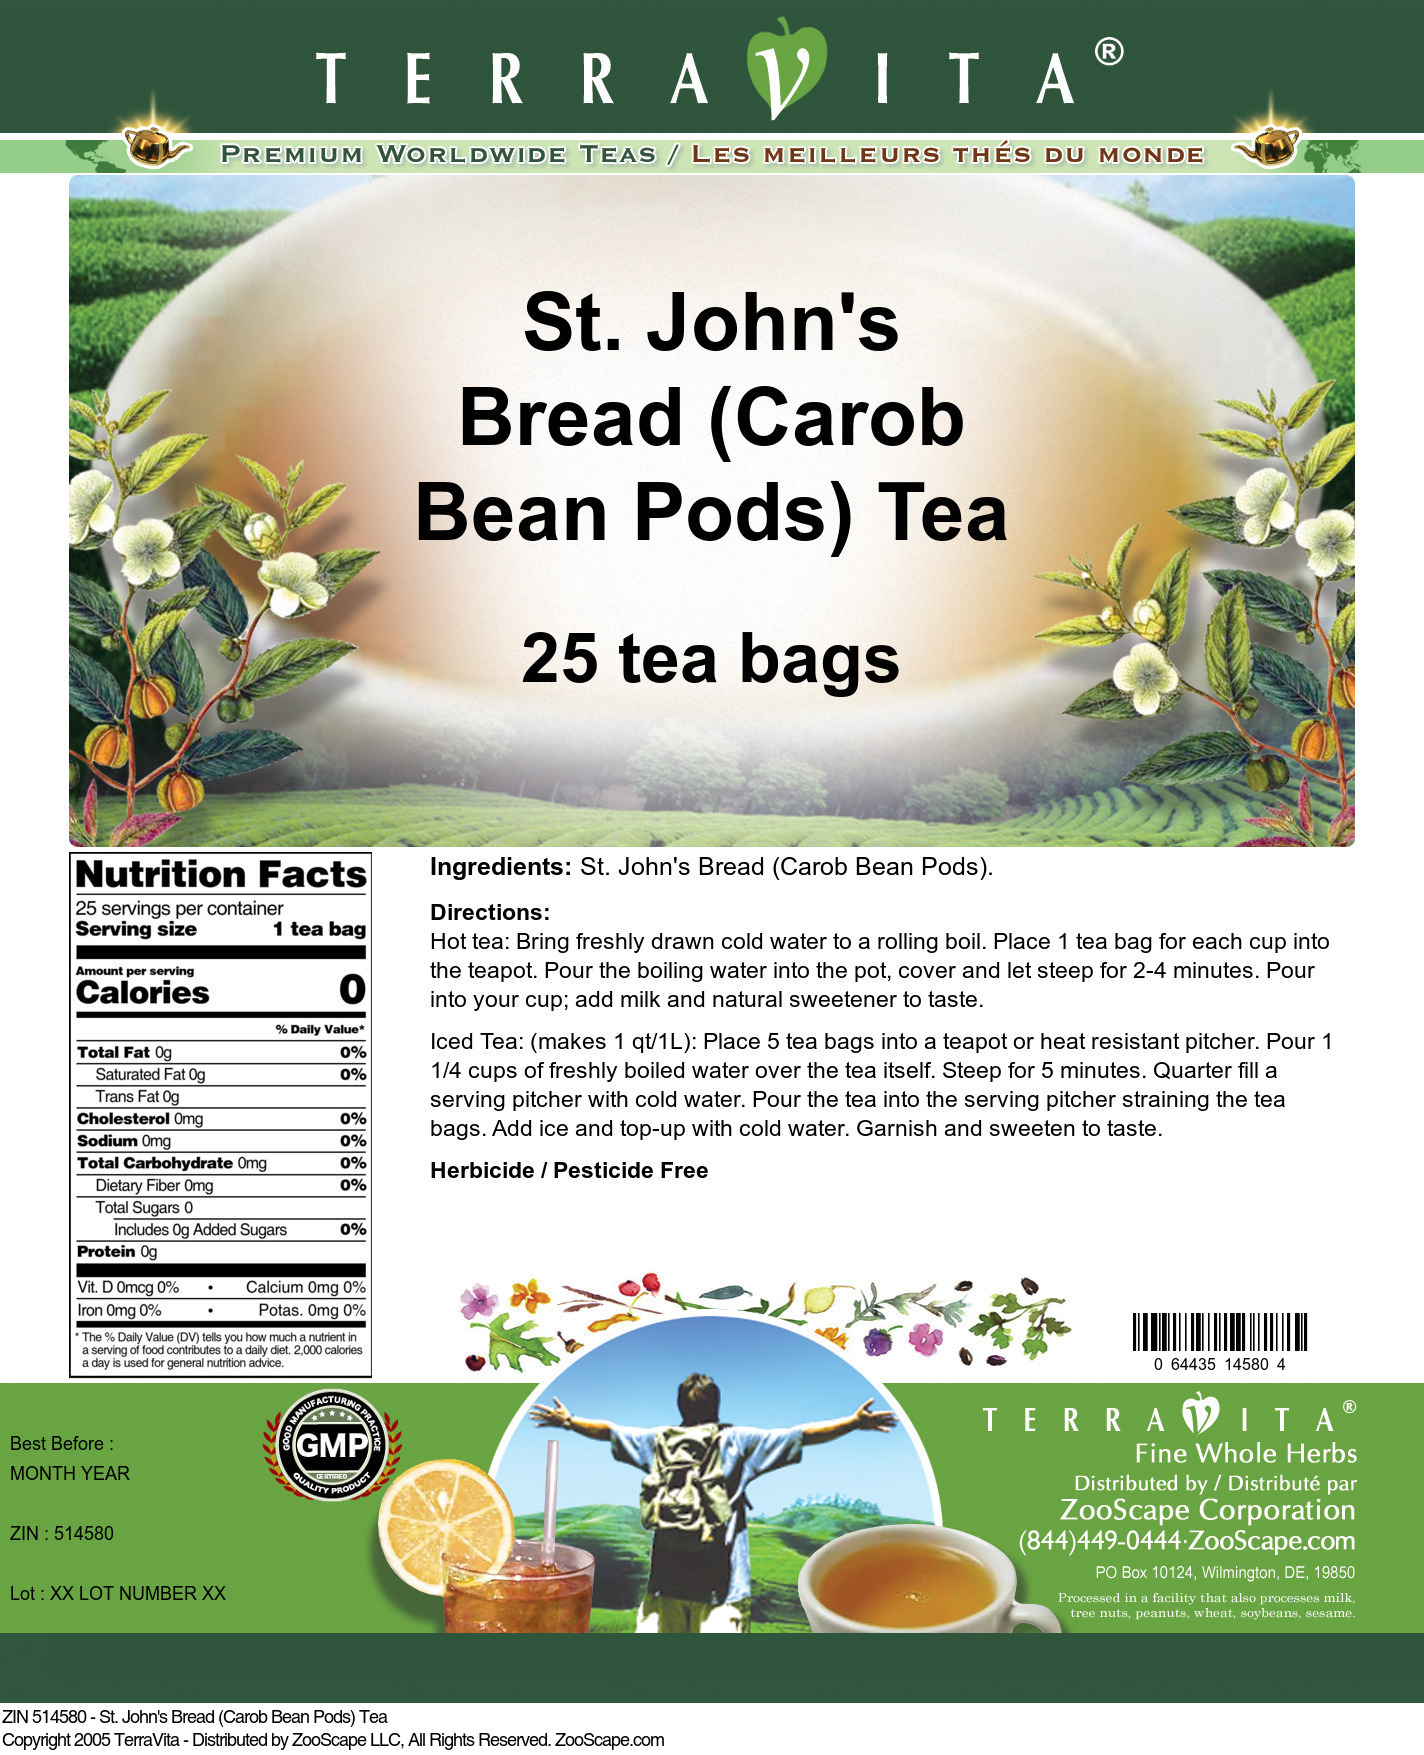 St. John's Bread (Carob Bean Pods) Tea